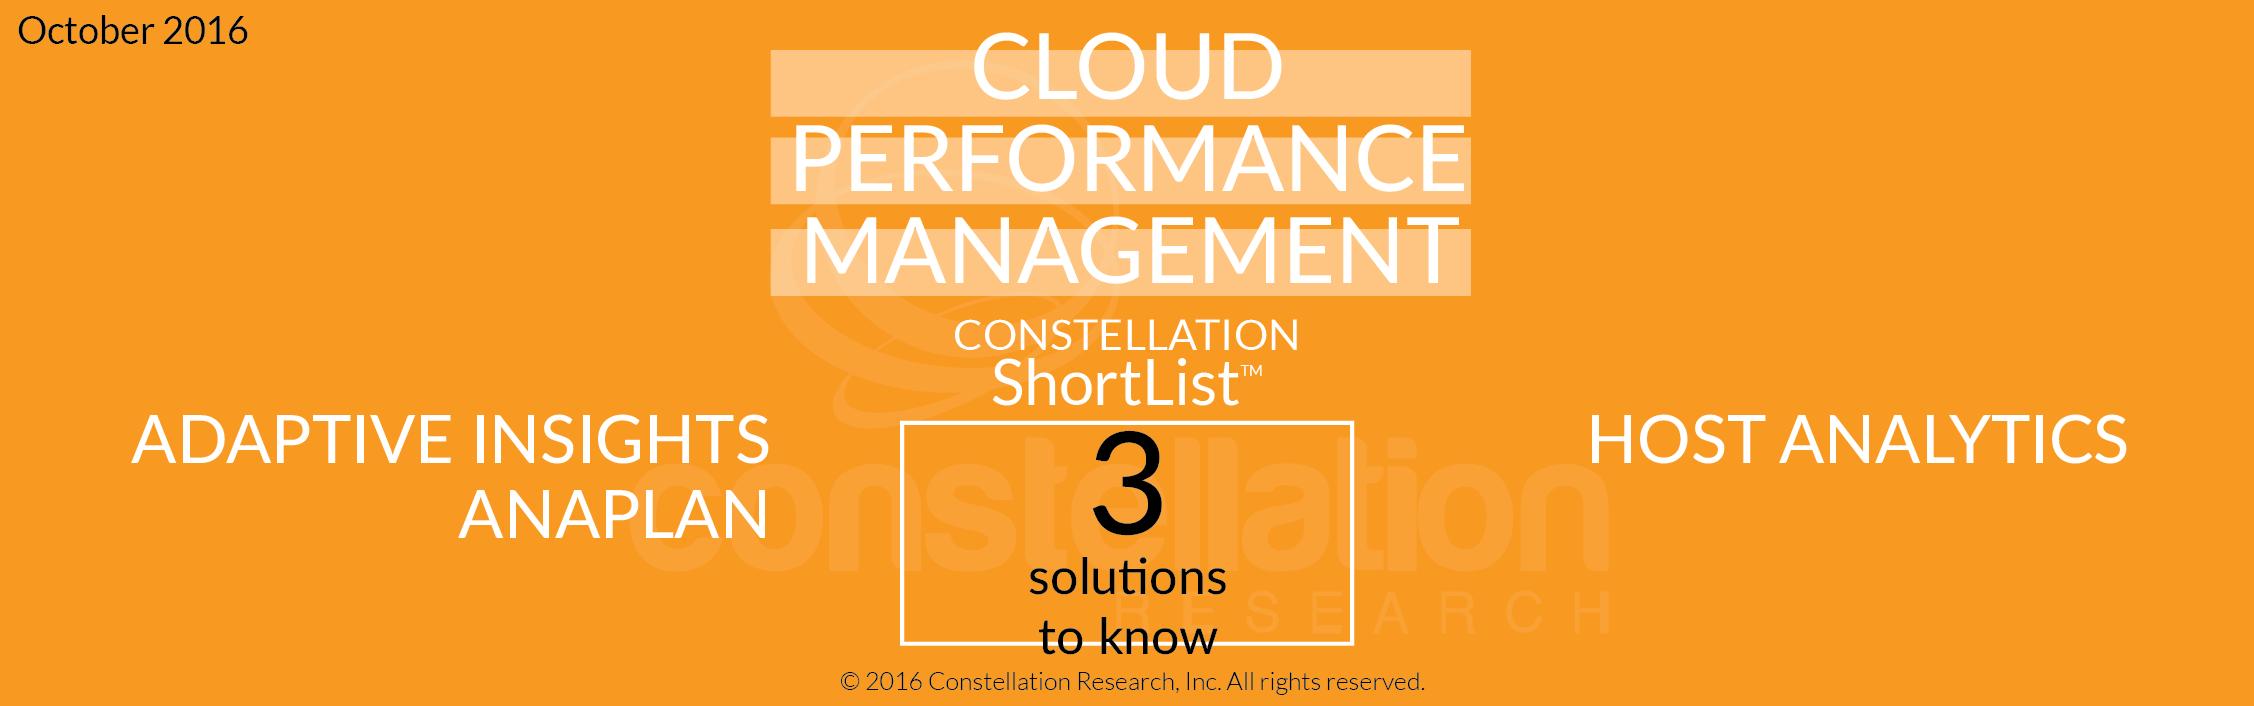 Cloud Performance Management Constellation ShortList